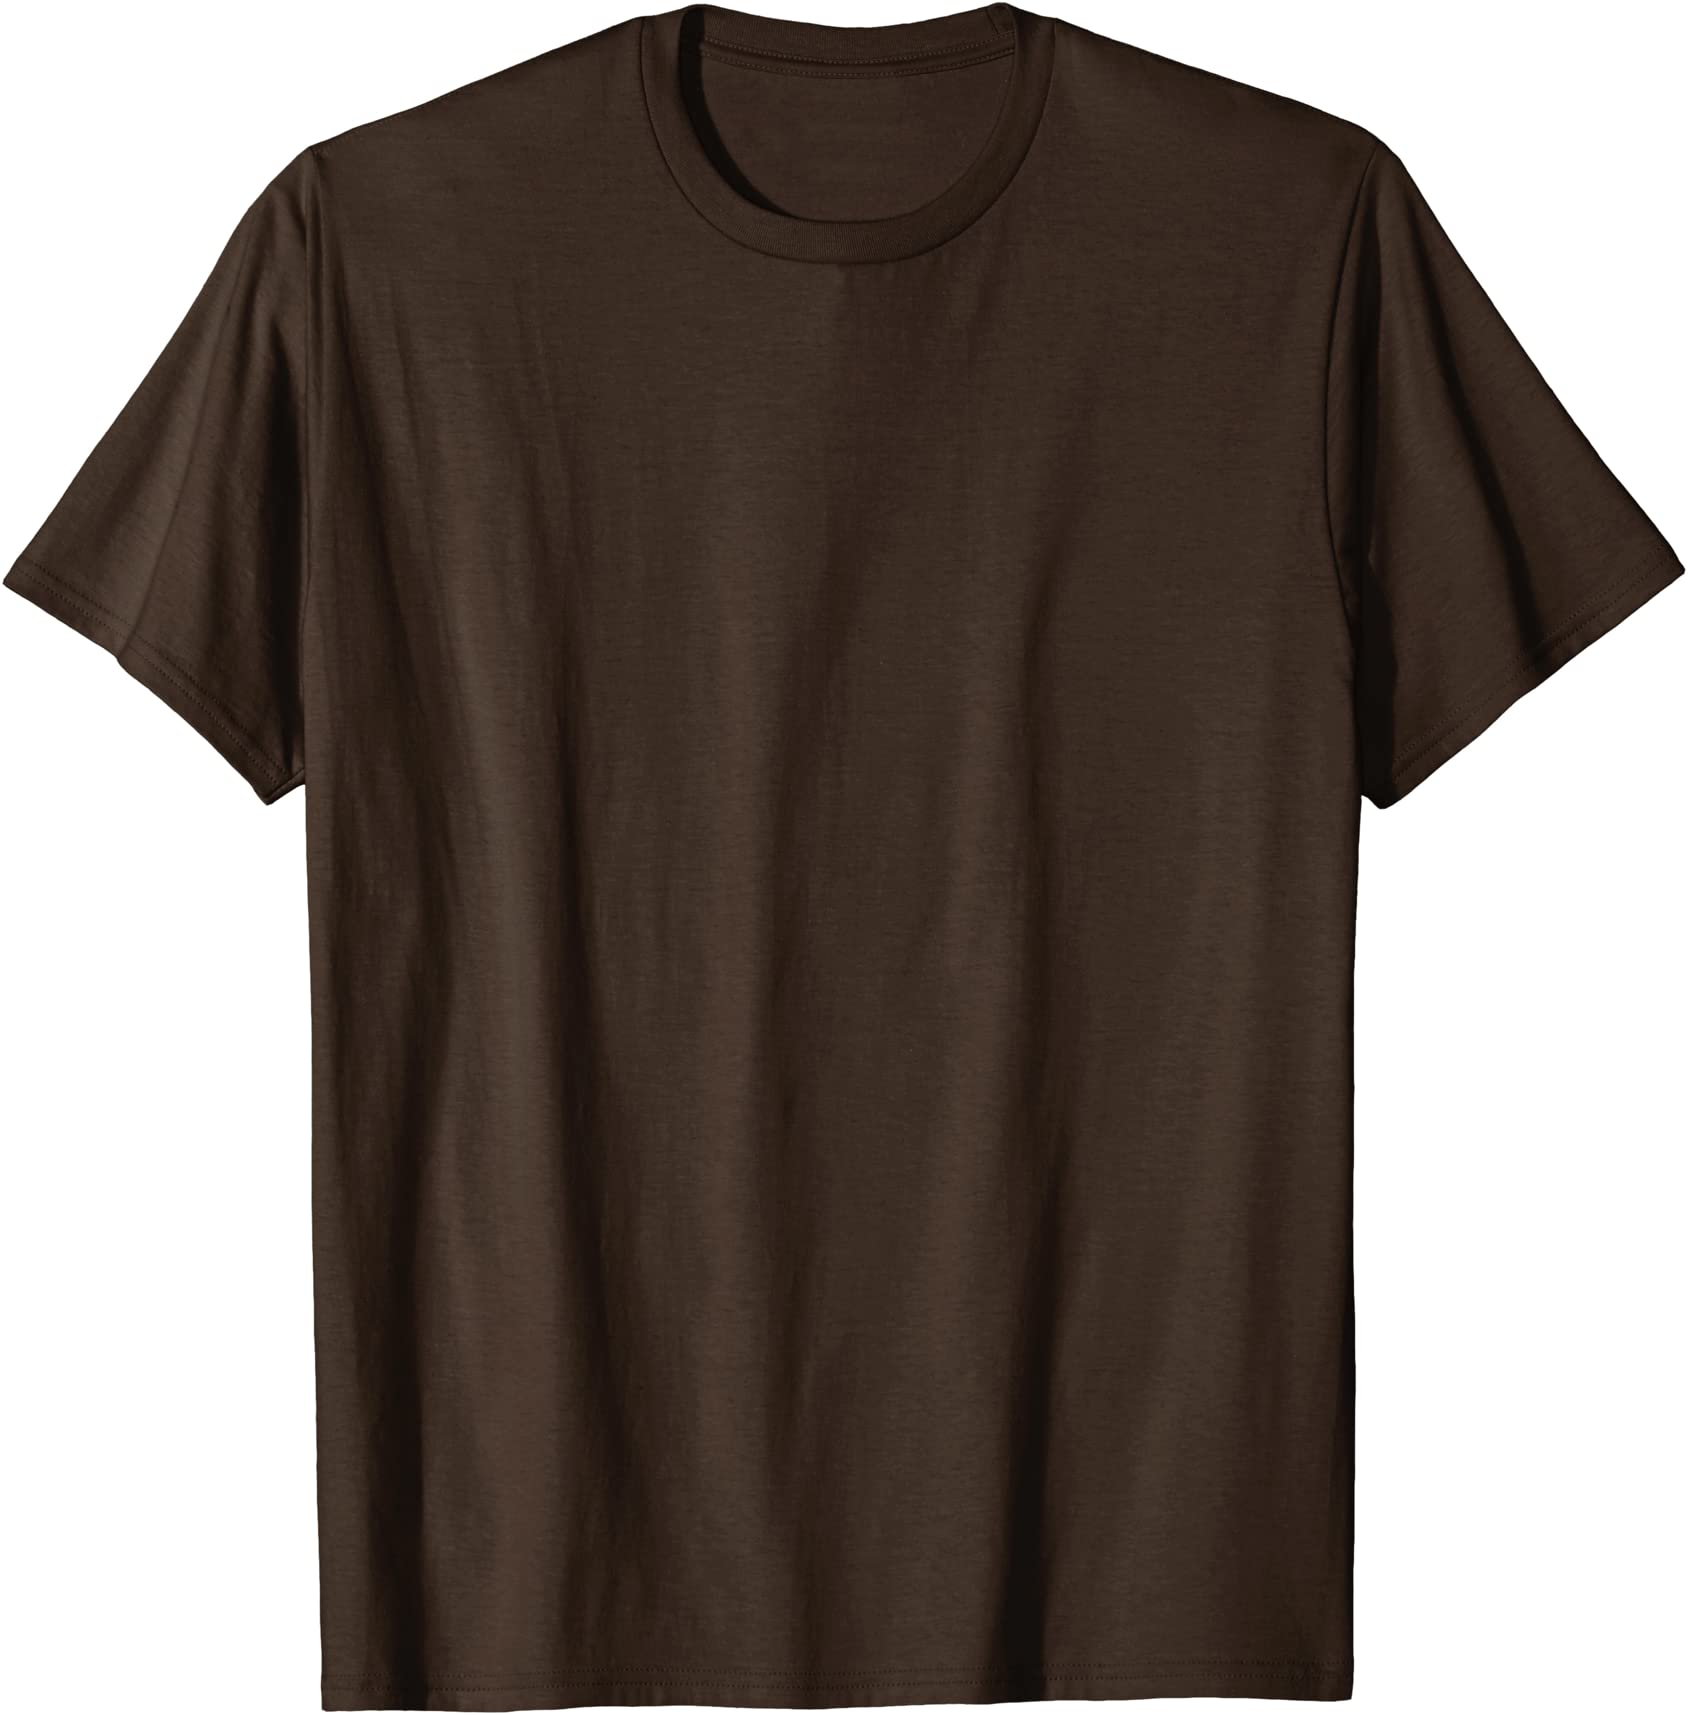 "US Navy Submarine Dolphin Black Cotton /""Jolly Roger/"" T-Shirt 3XL Free Shipping!"